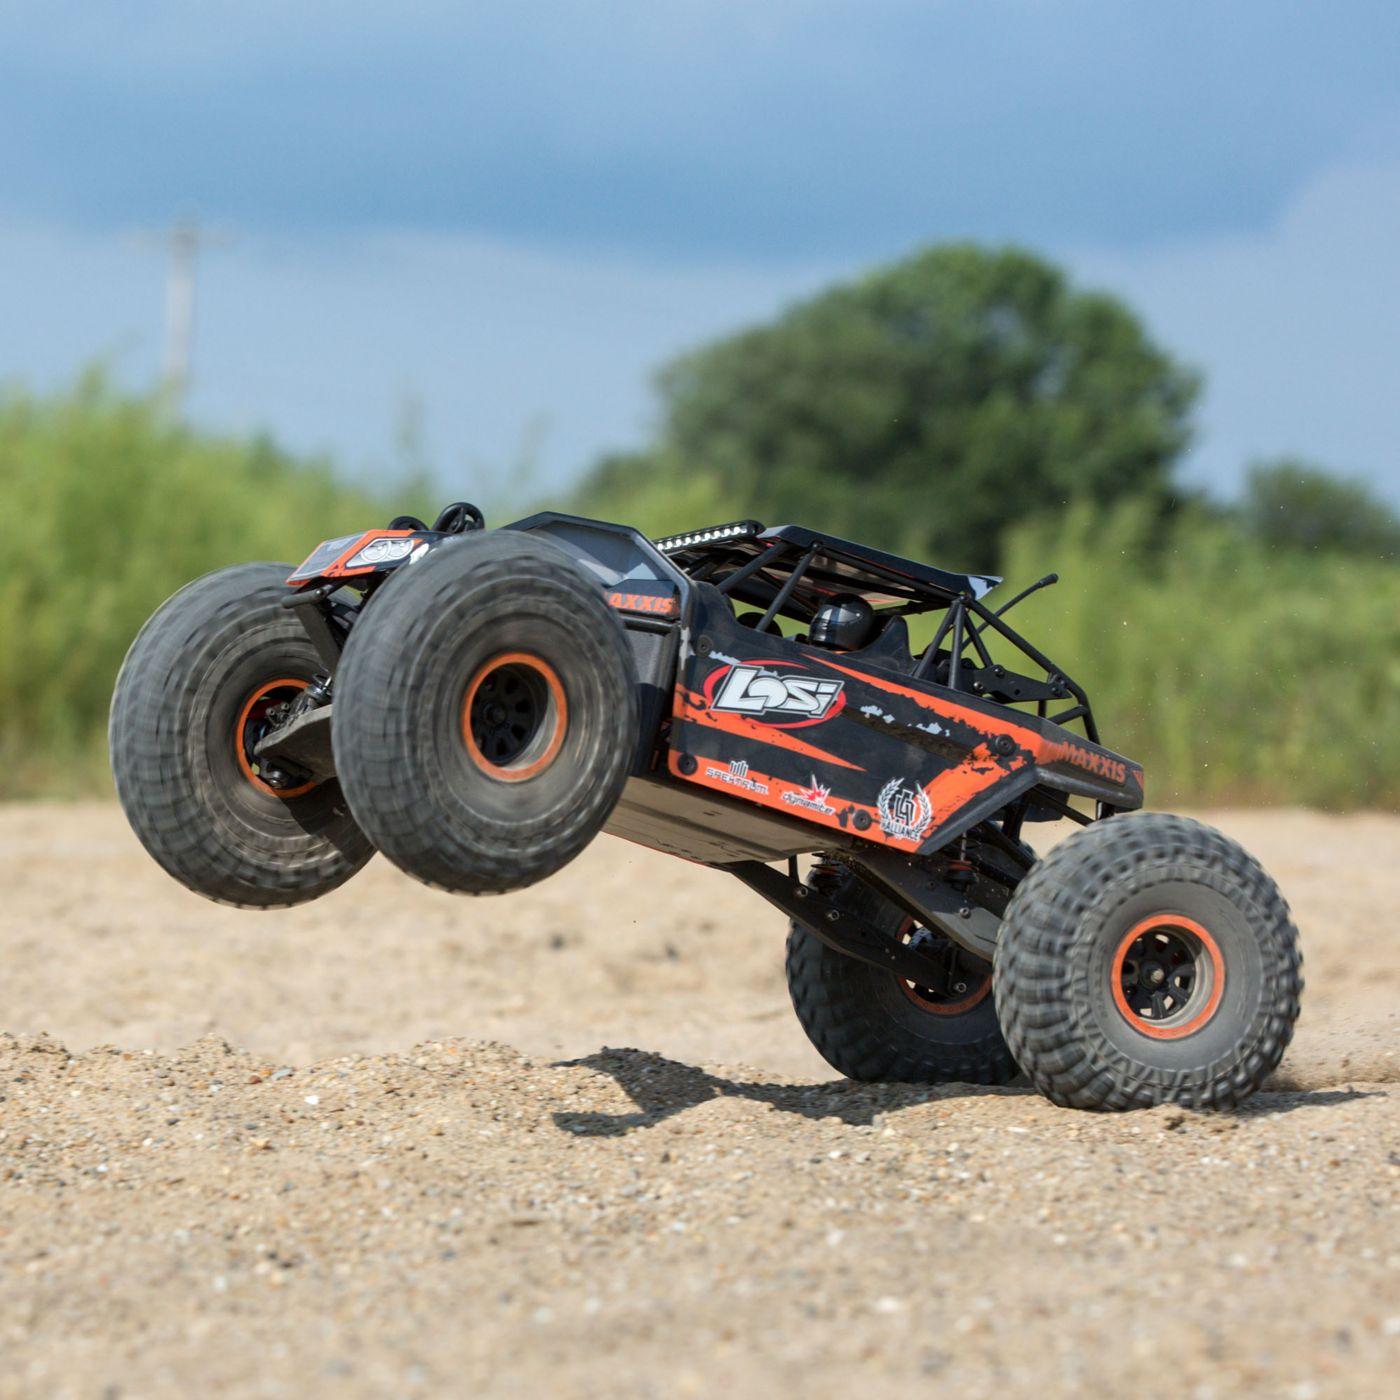 Losi Rock Rey Buggy Rock Racer brushless avc bnd 2